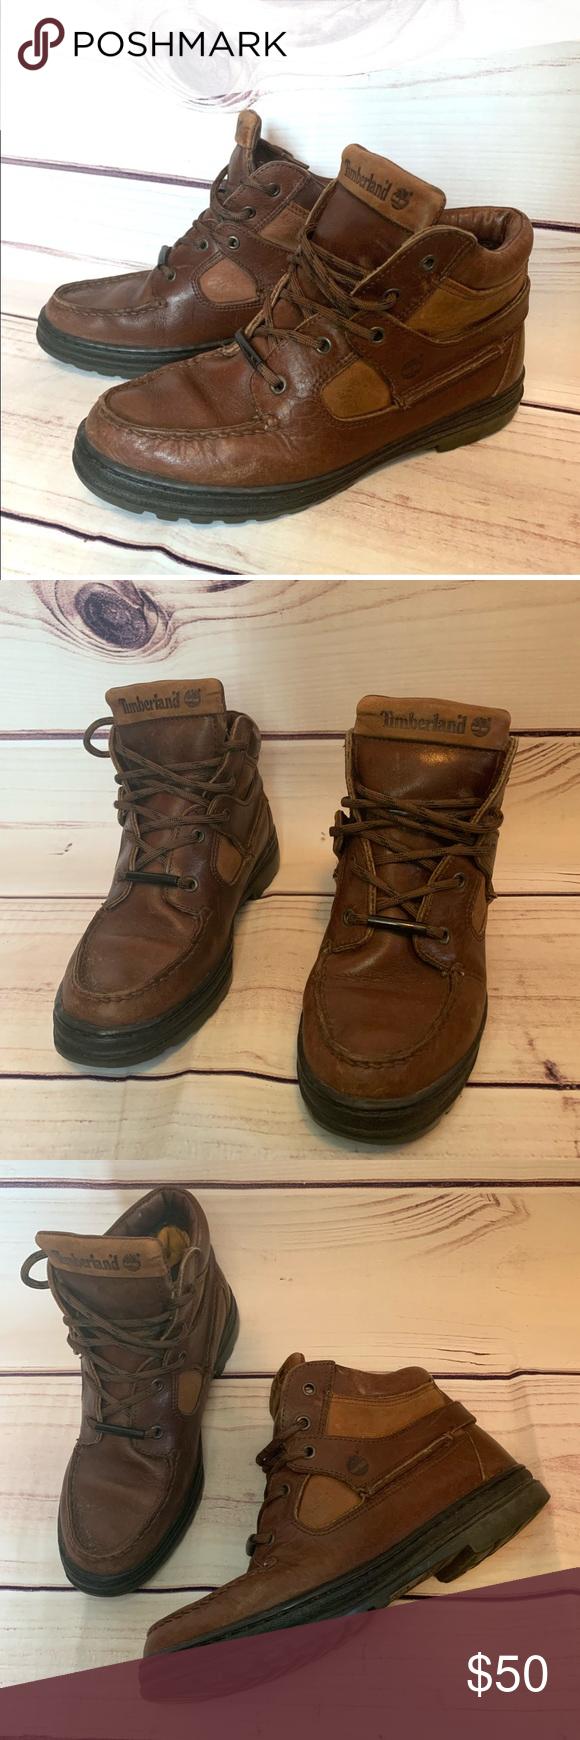 1d9fef66528 Timberland Goretex Leather Chukka Hiking Boots 7.5 Timberland 7.5 ...